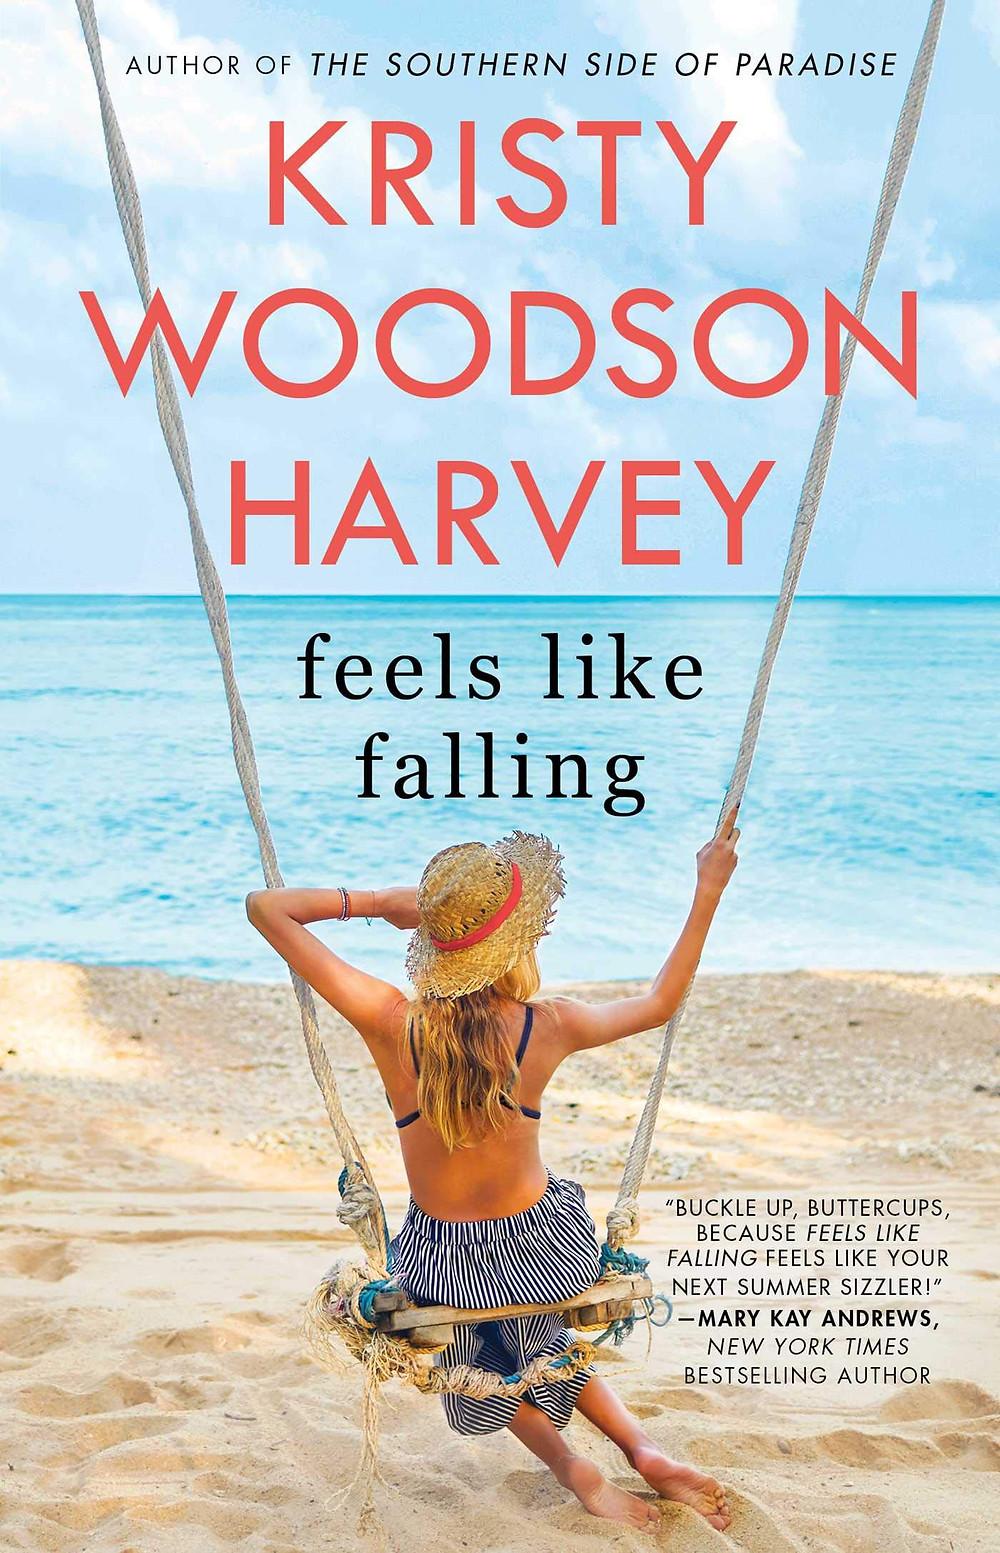 Kristy Woodson Harvey